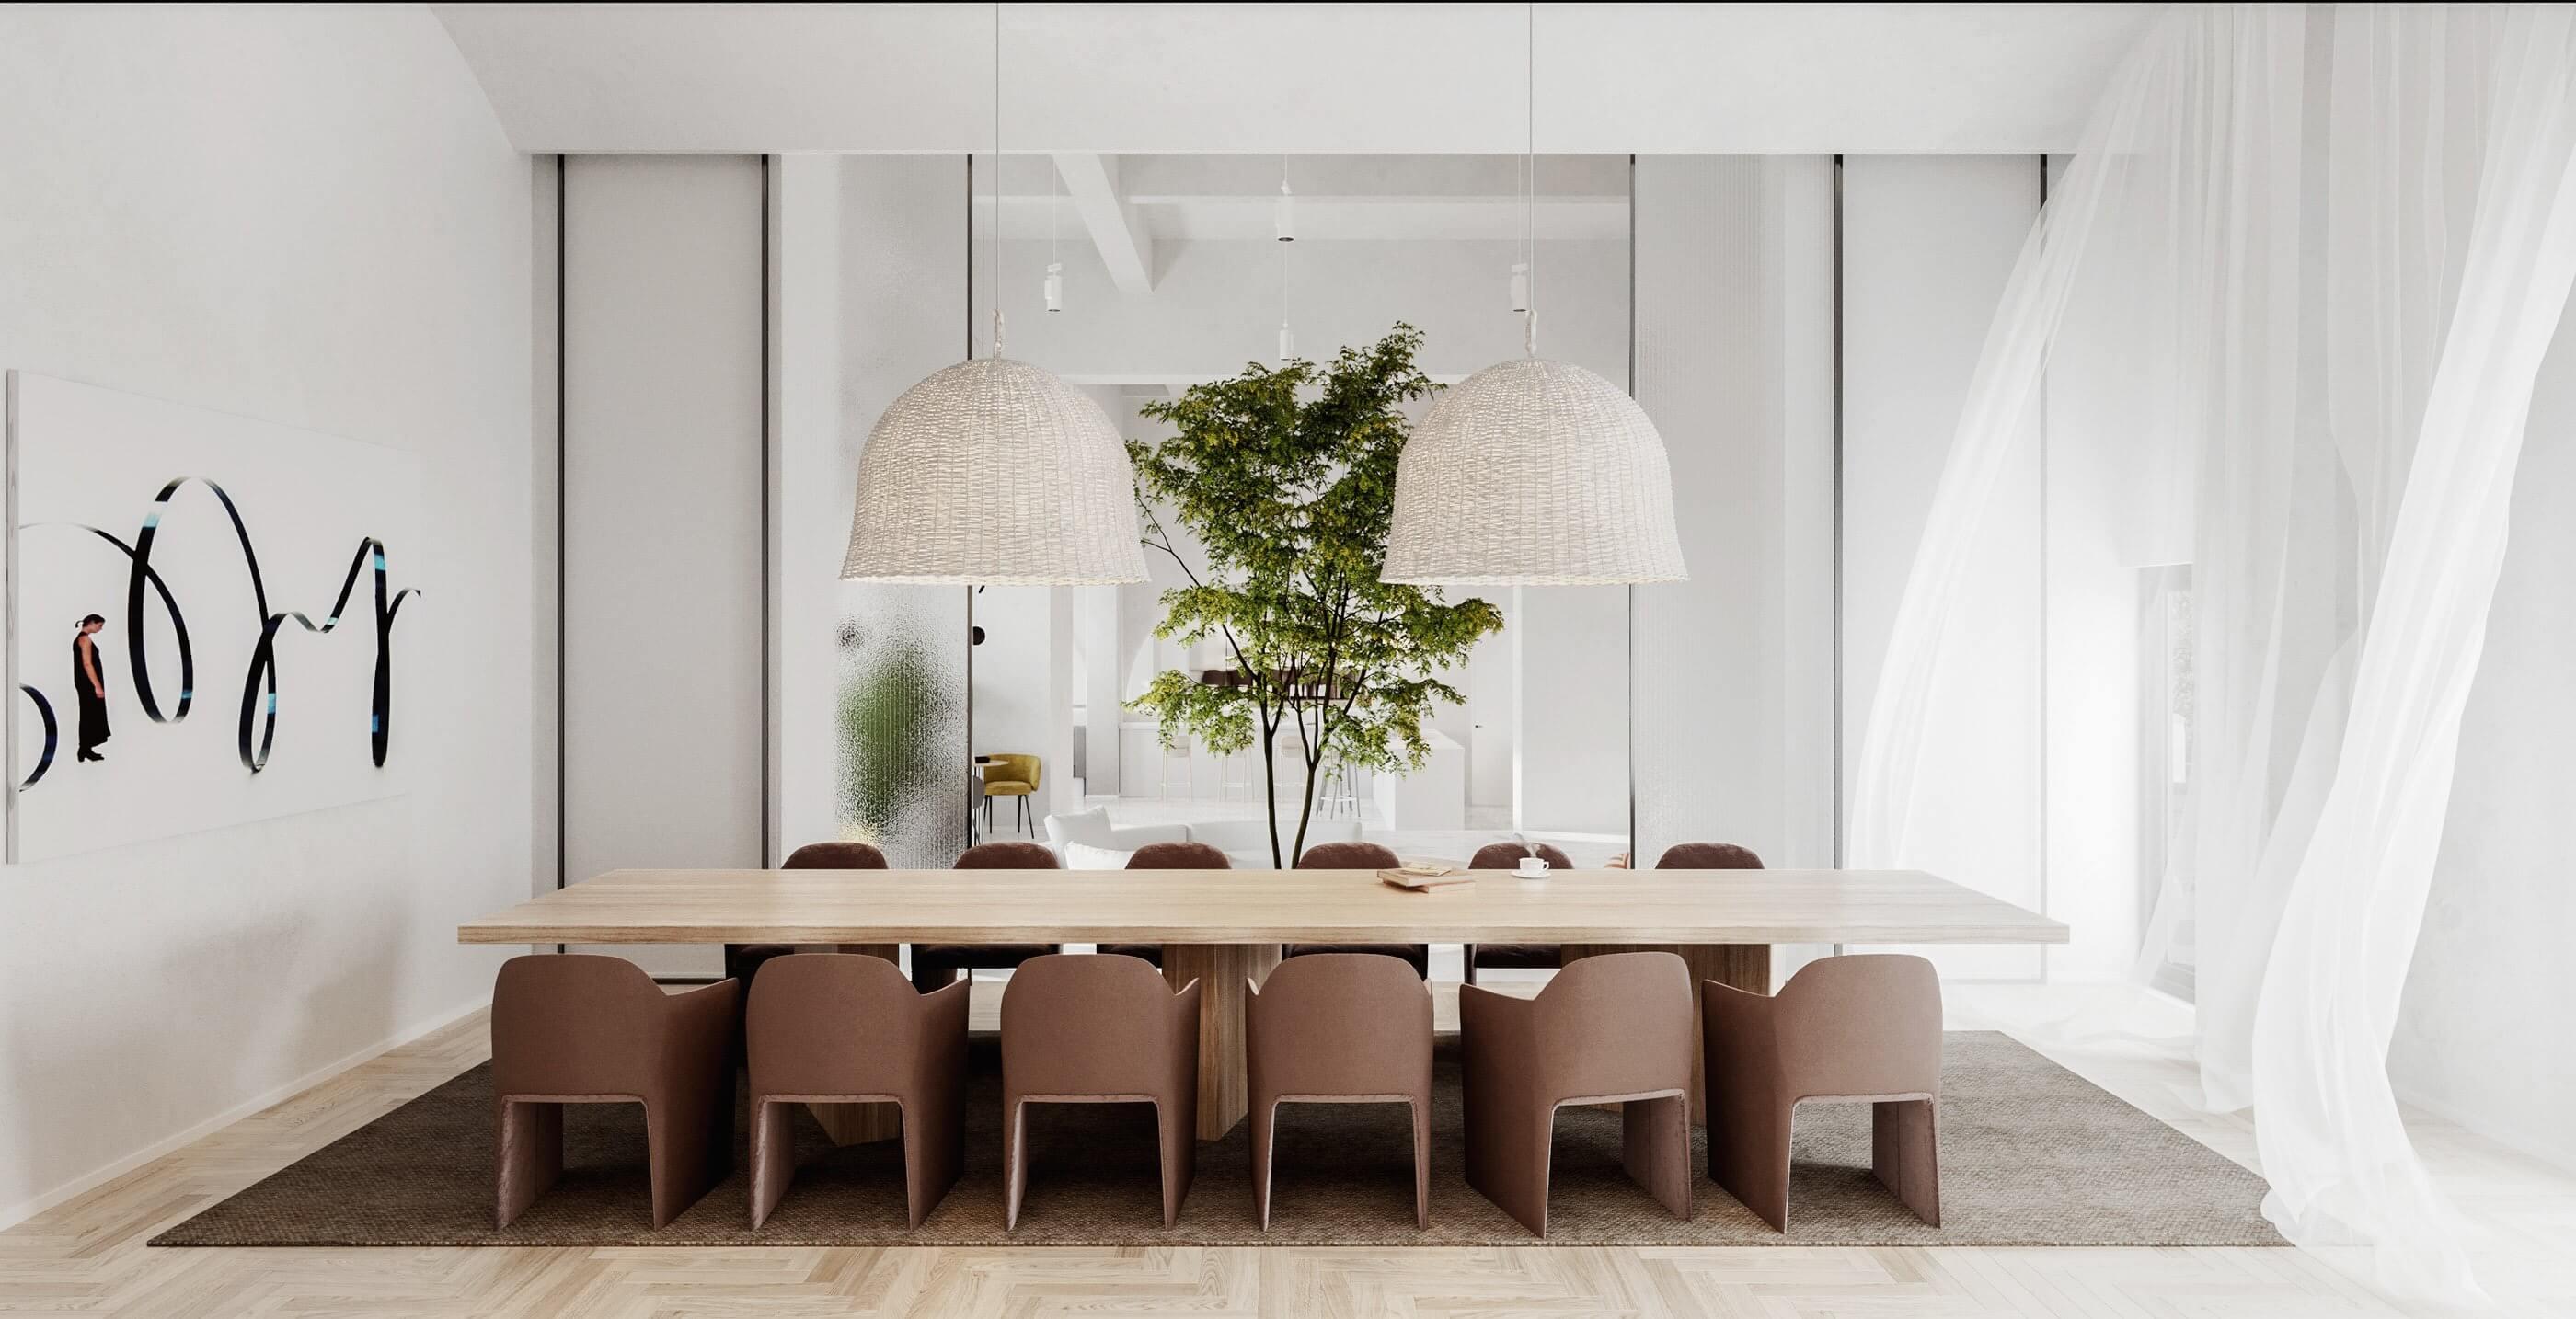 Modern bar restaurant design dining area wood table - cgi visualization